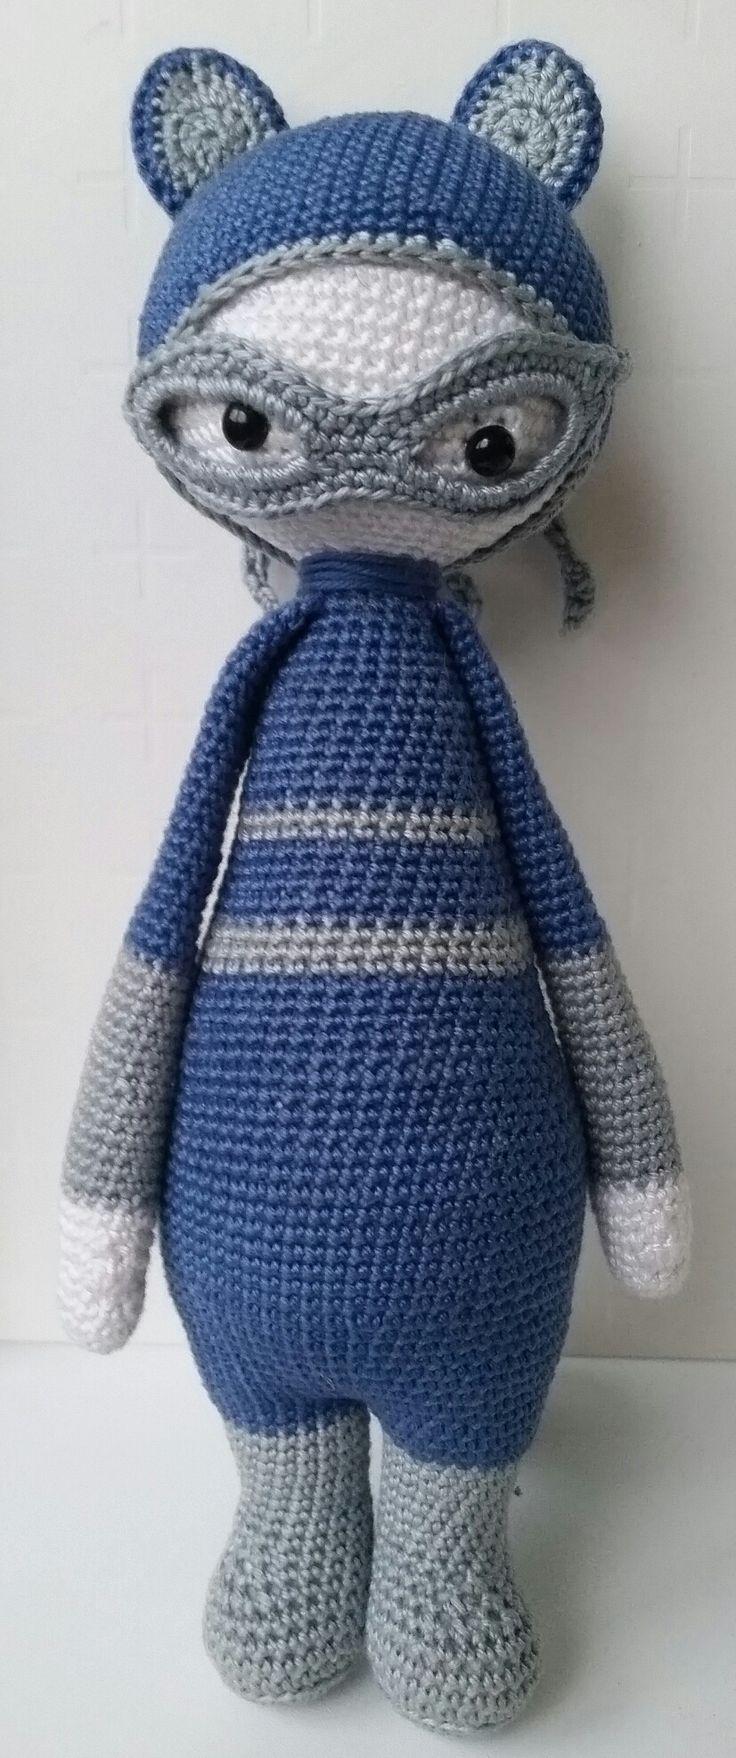 Roco raccoon made by Waida / crochet pattern by lalylala